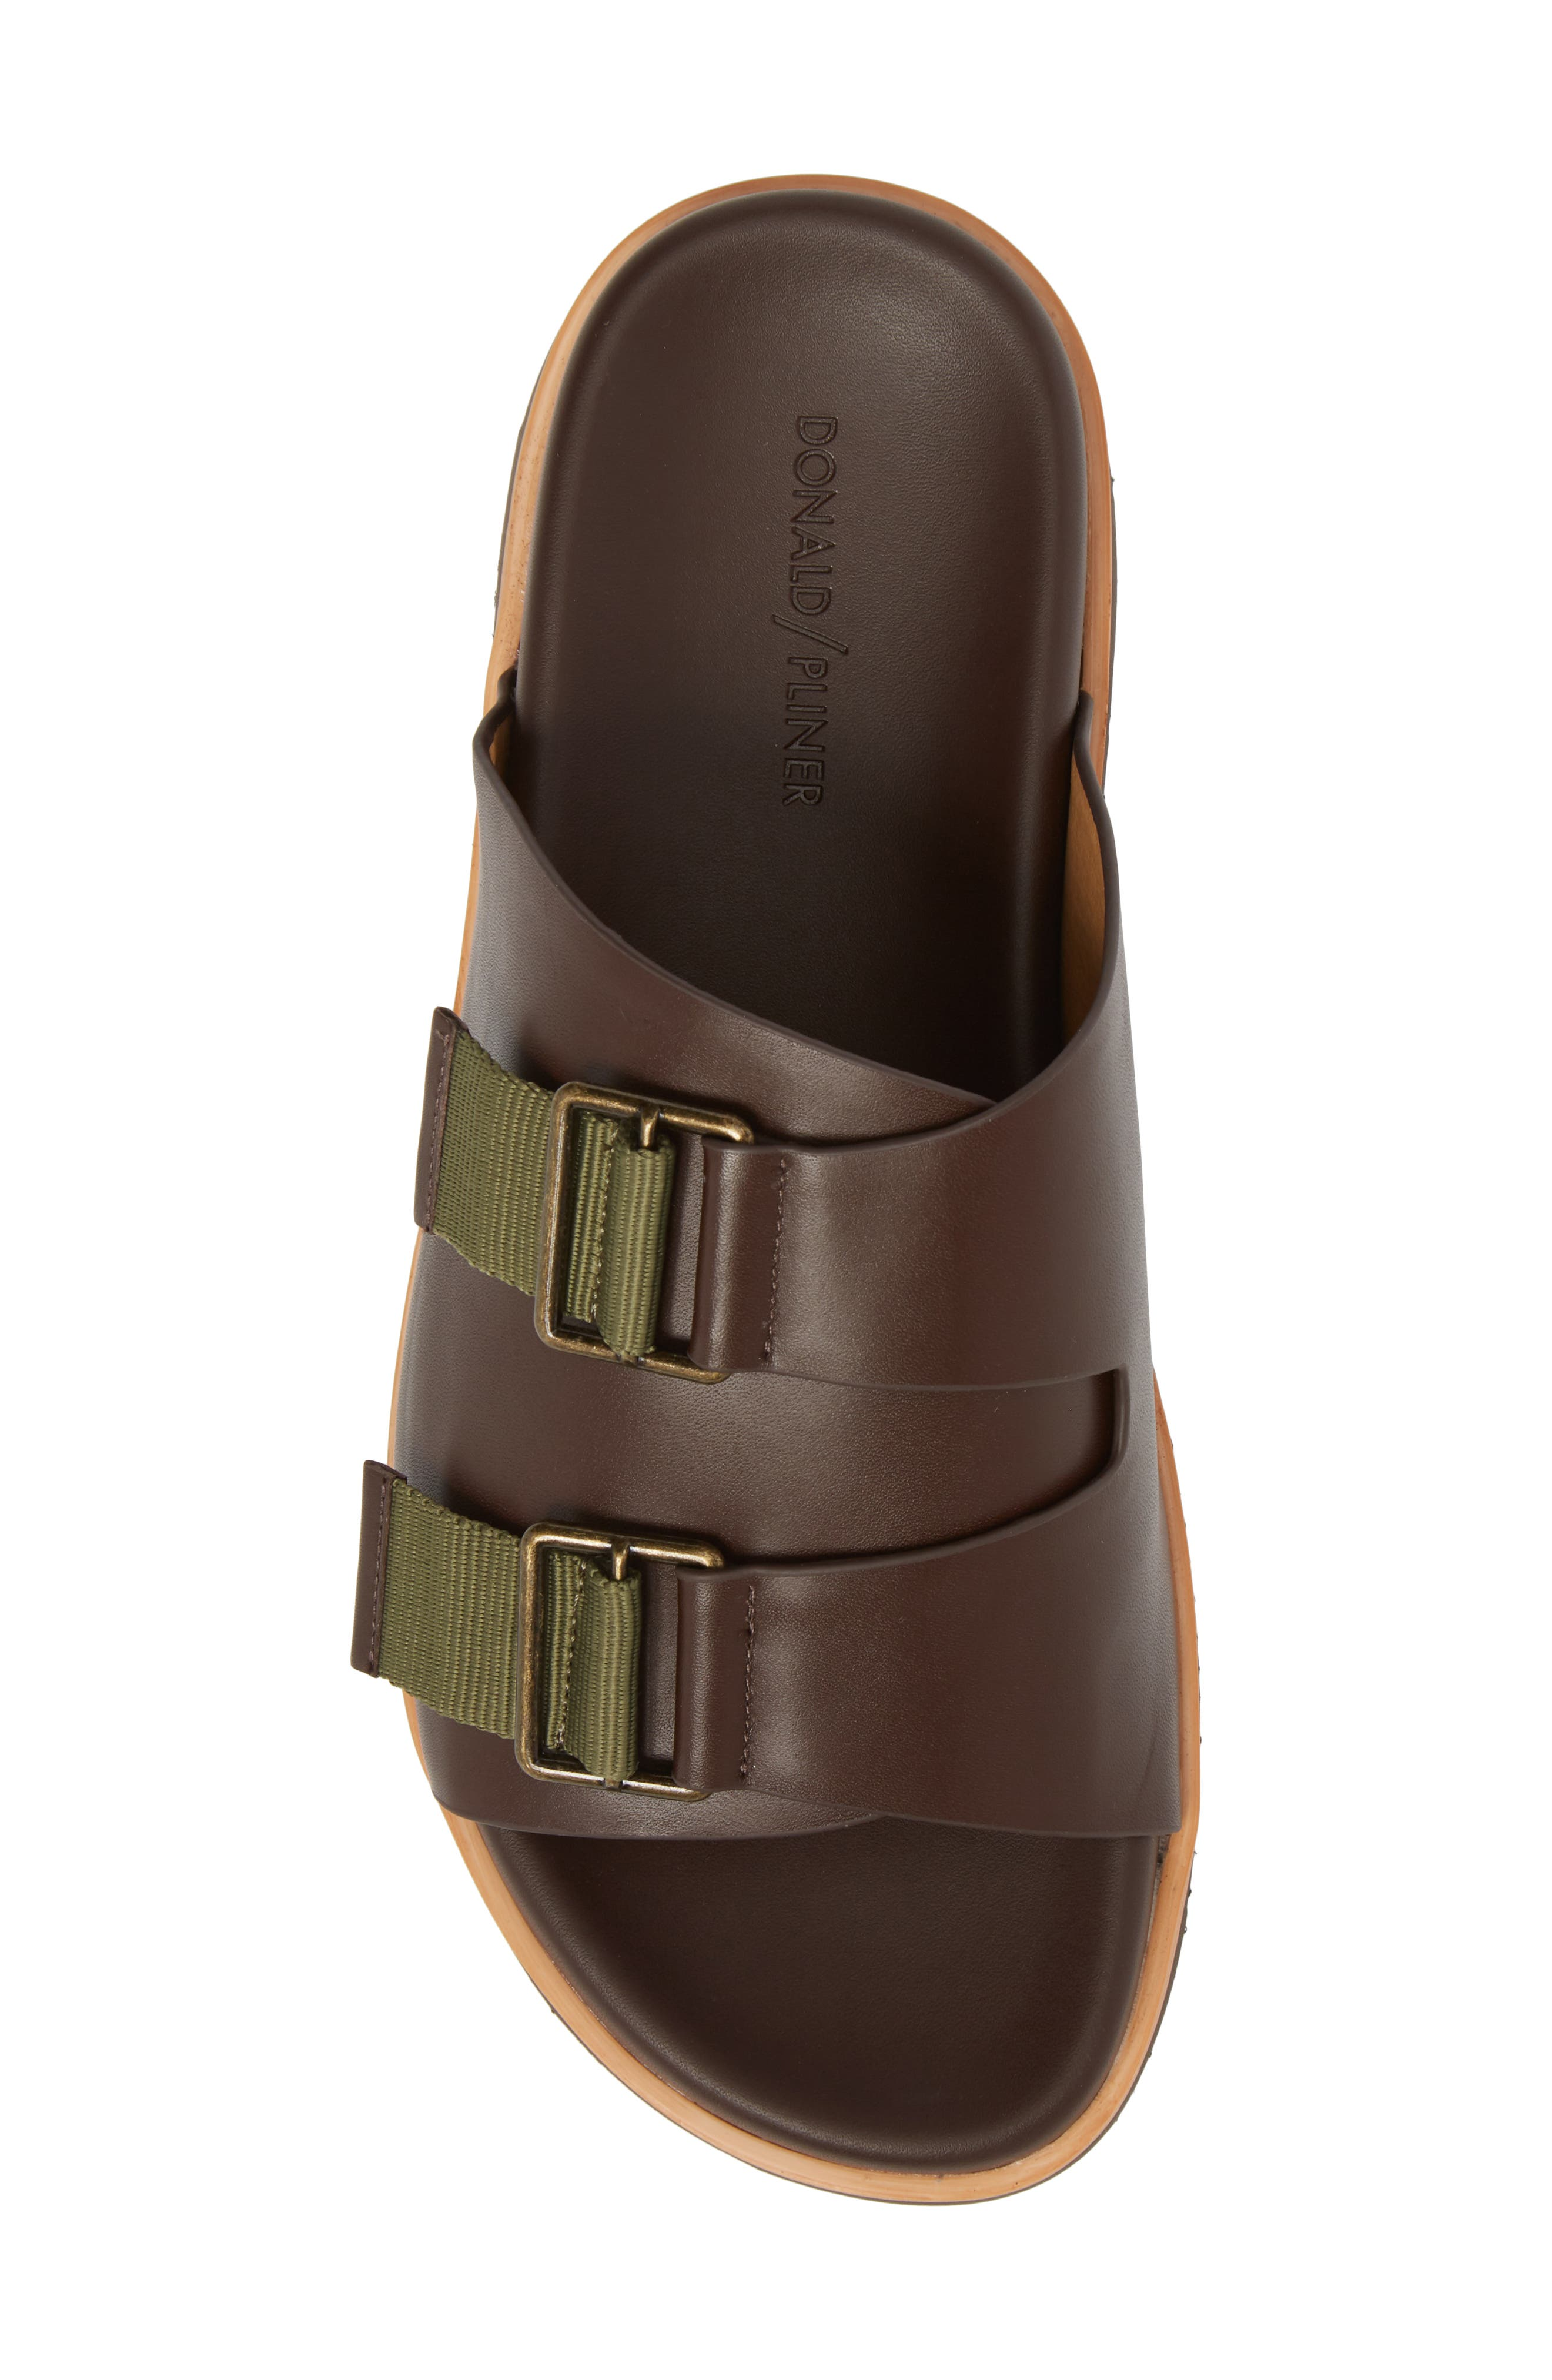 Slide Sandal,                             Alternate thumbnail 5, color,                             Expresso/ Tan Leather